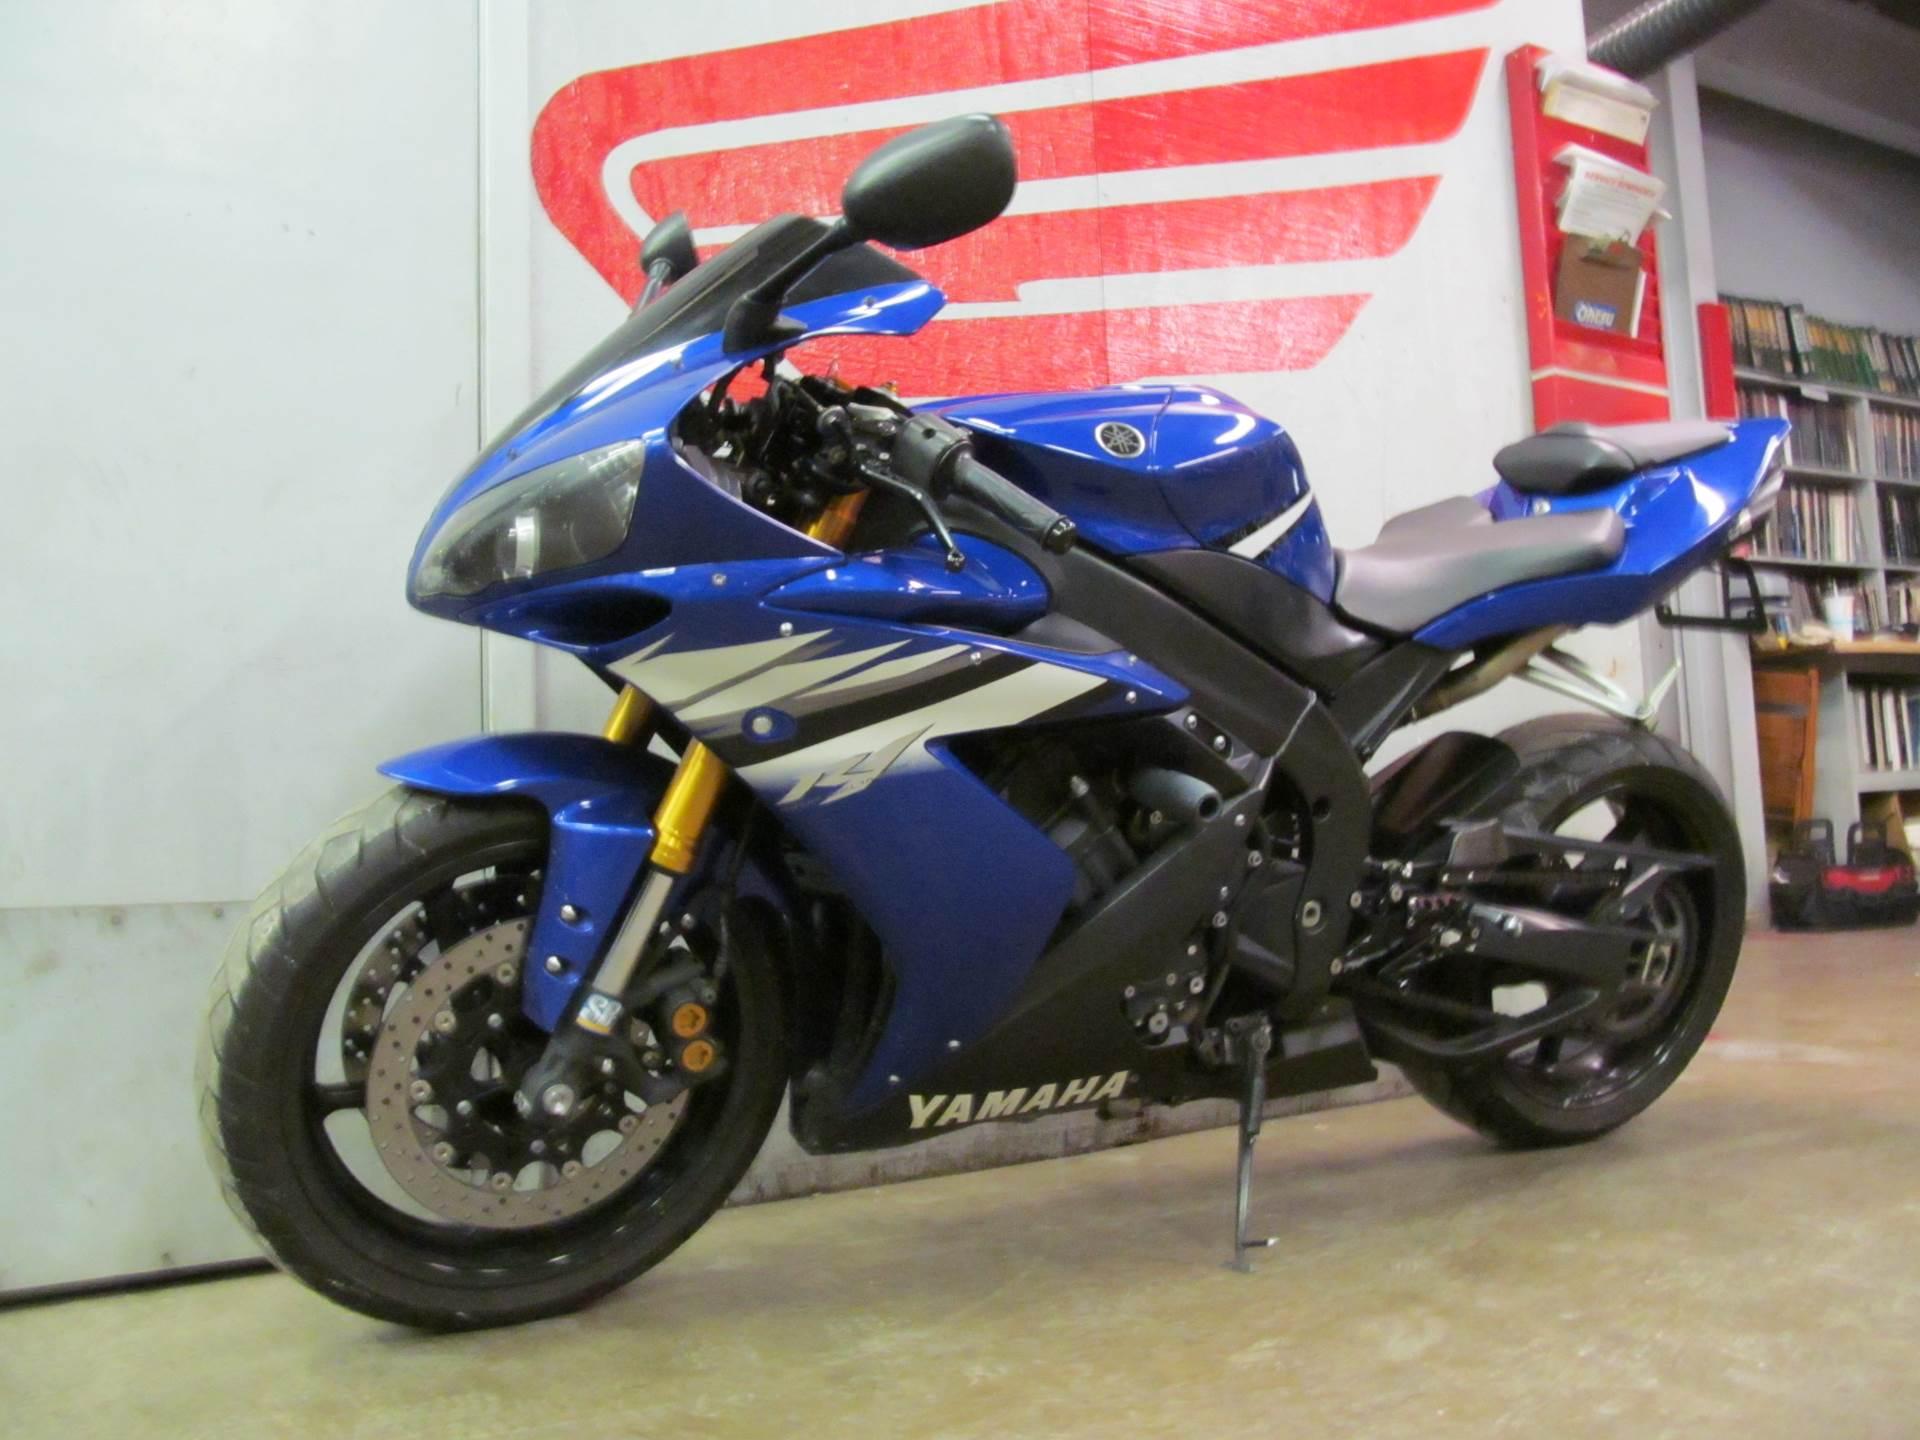 2006 Yamaha YZF-R1 4